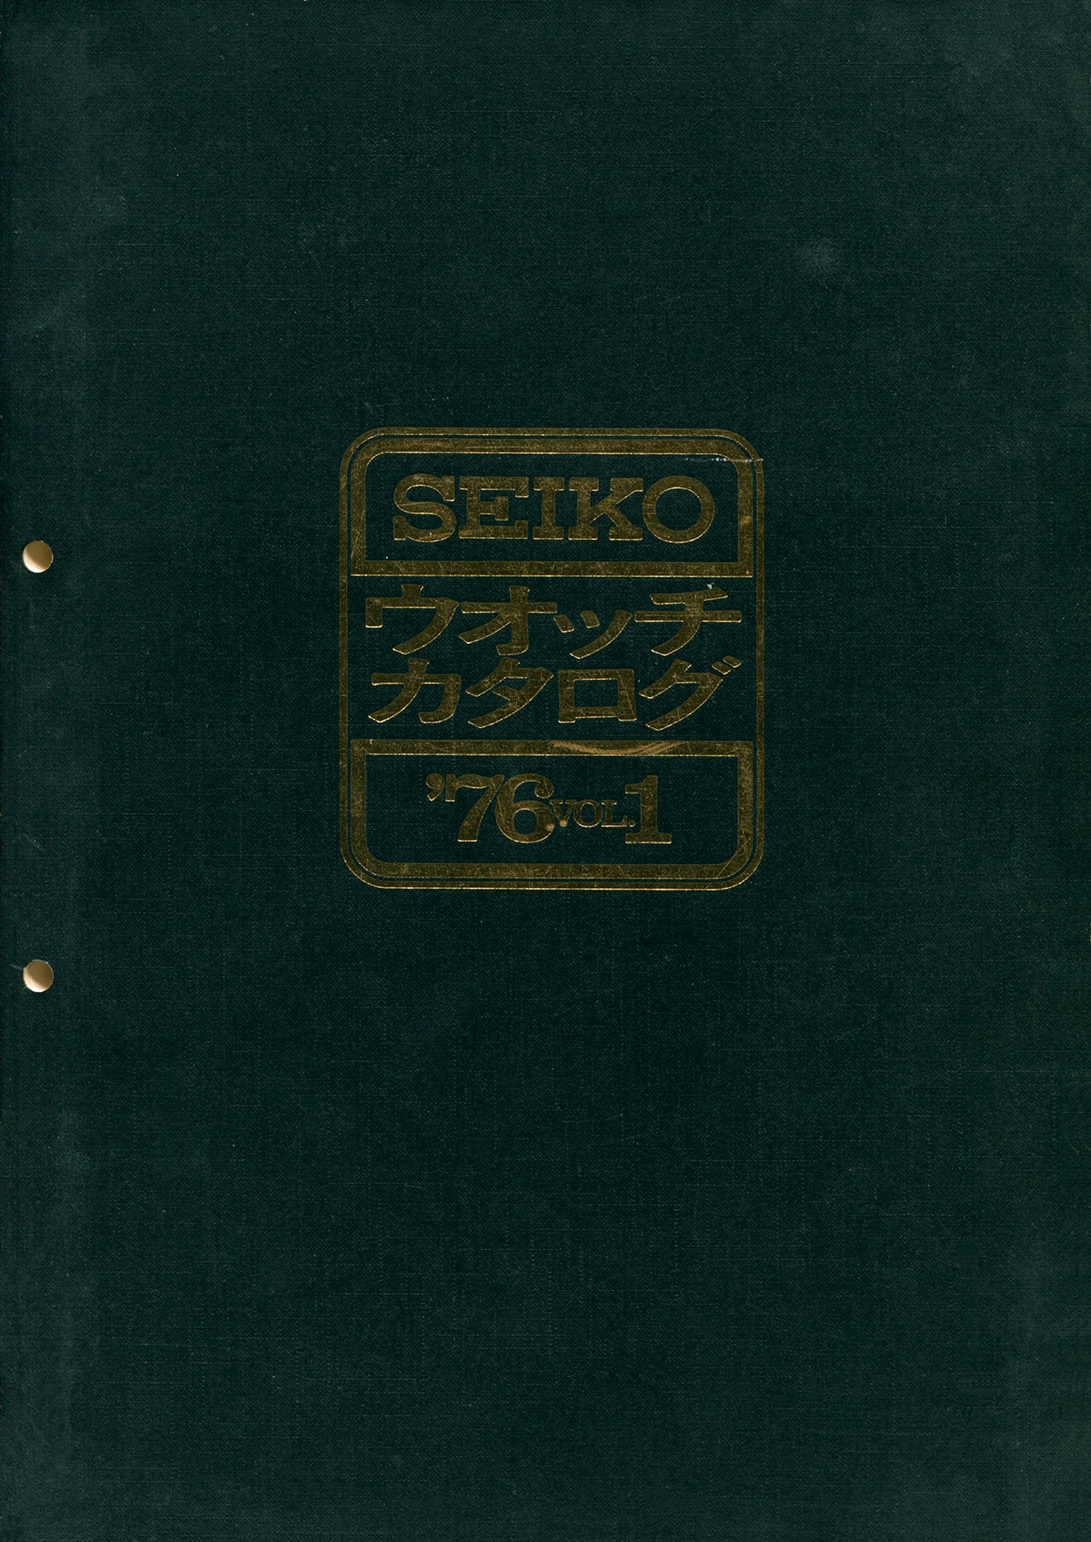 1976 Seiko Vol.1 (2MB)